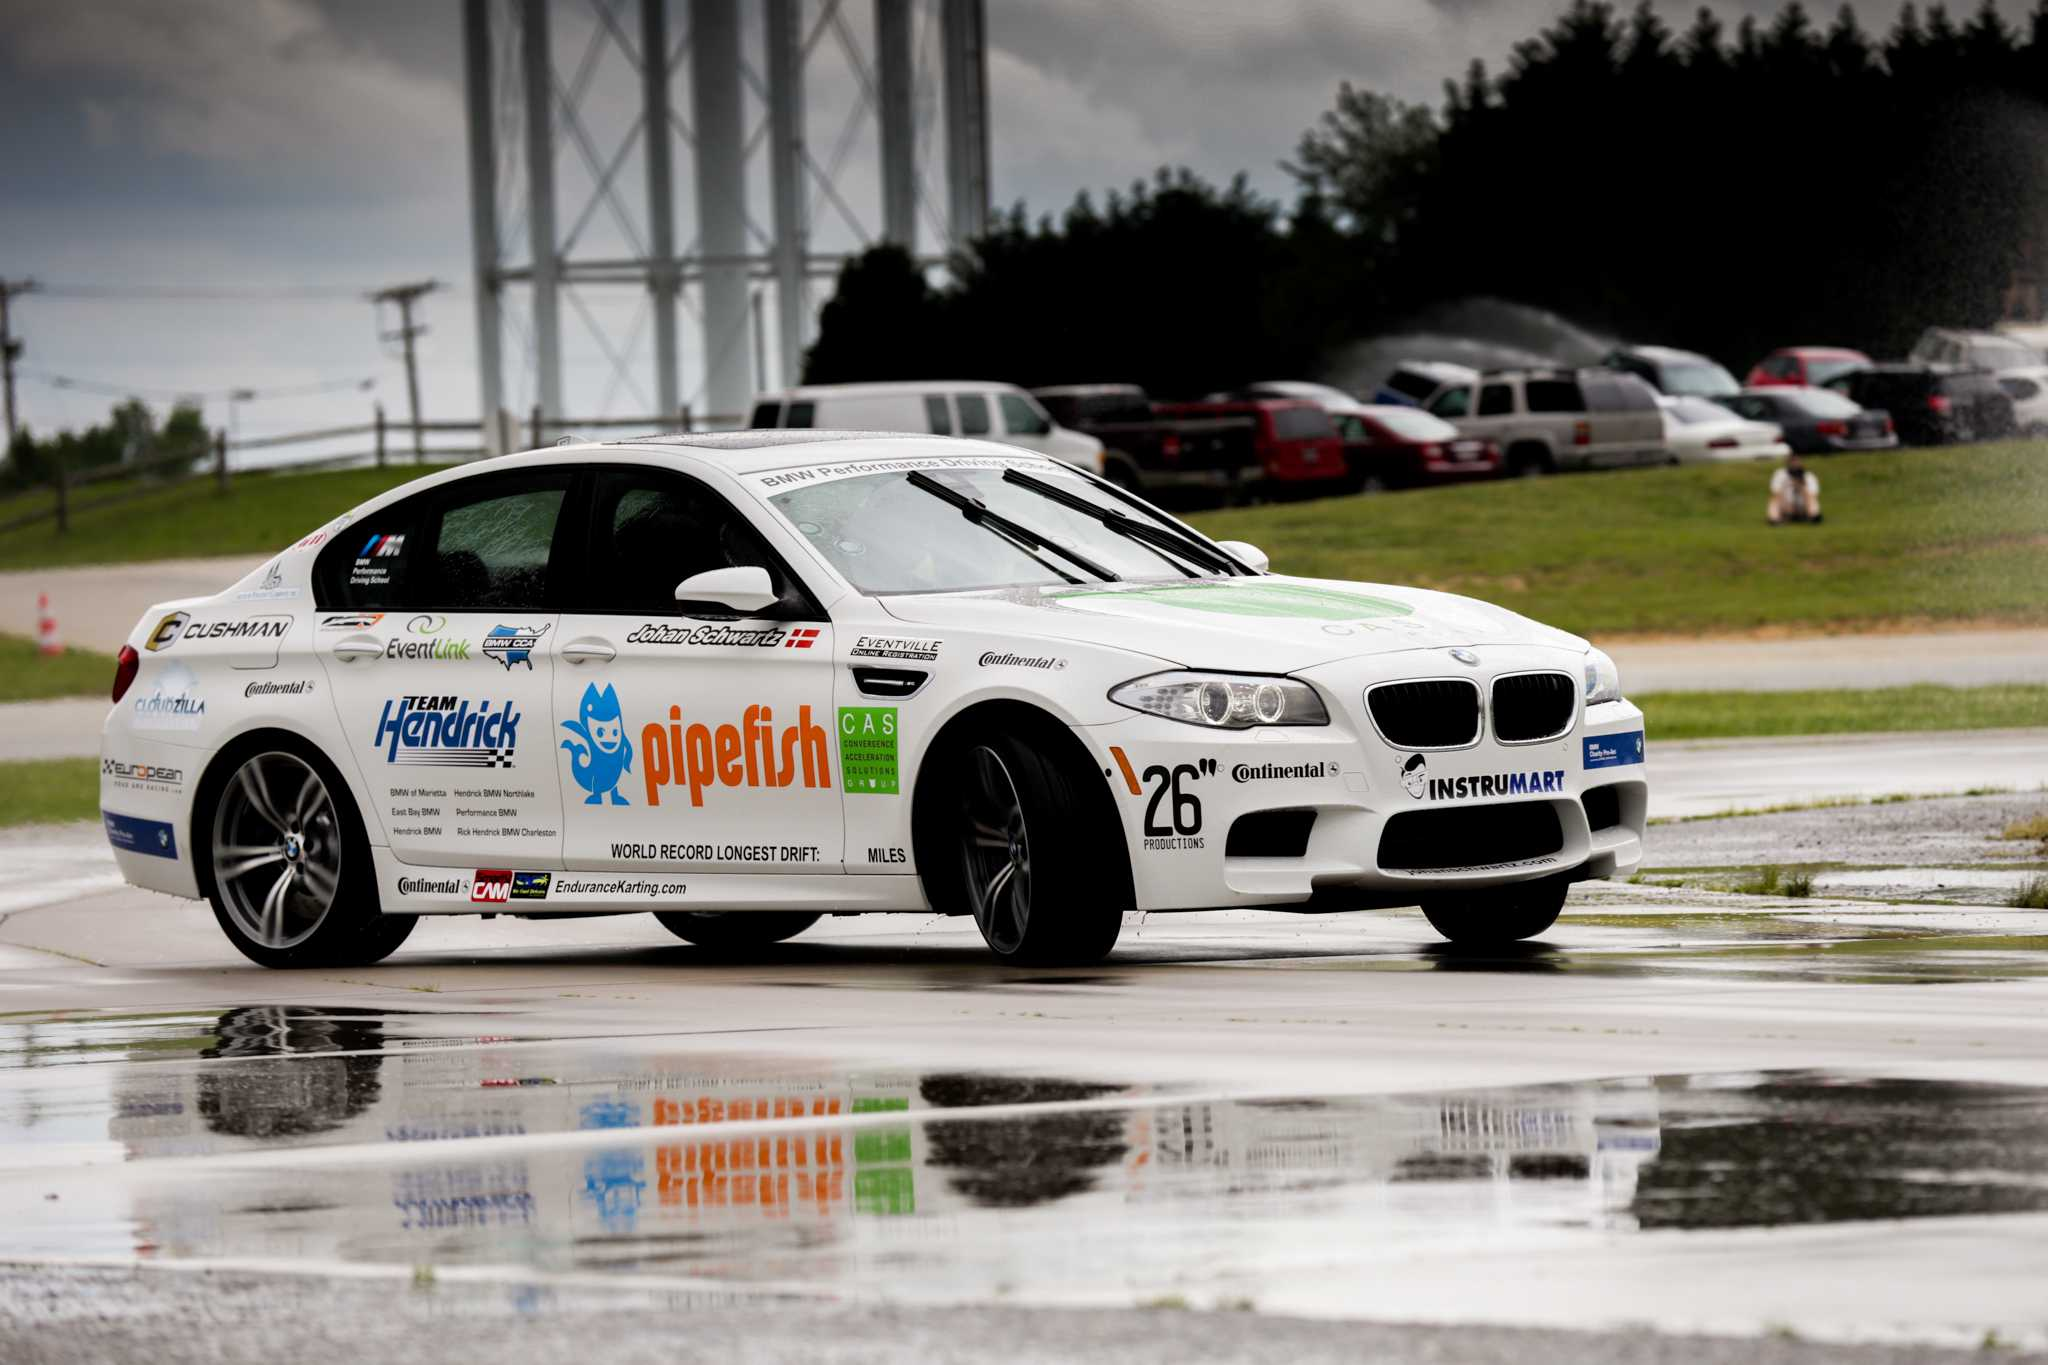 Bmw Performance Driving School Sets Guinness World Drift Record With Bmw M5 Sedan